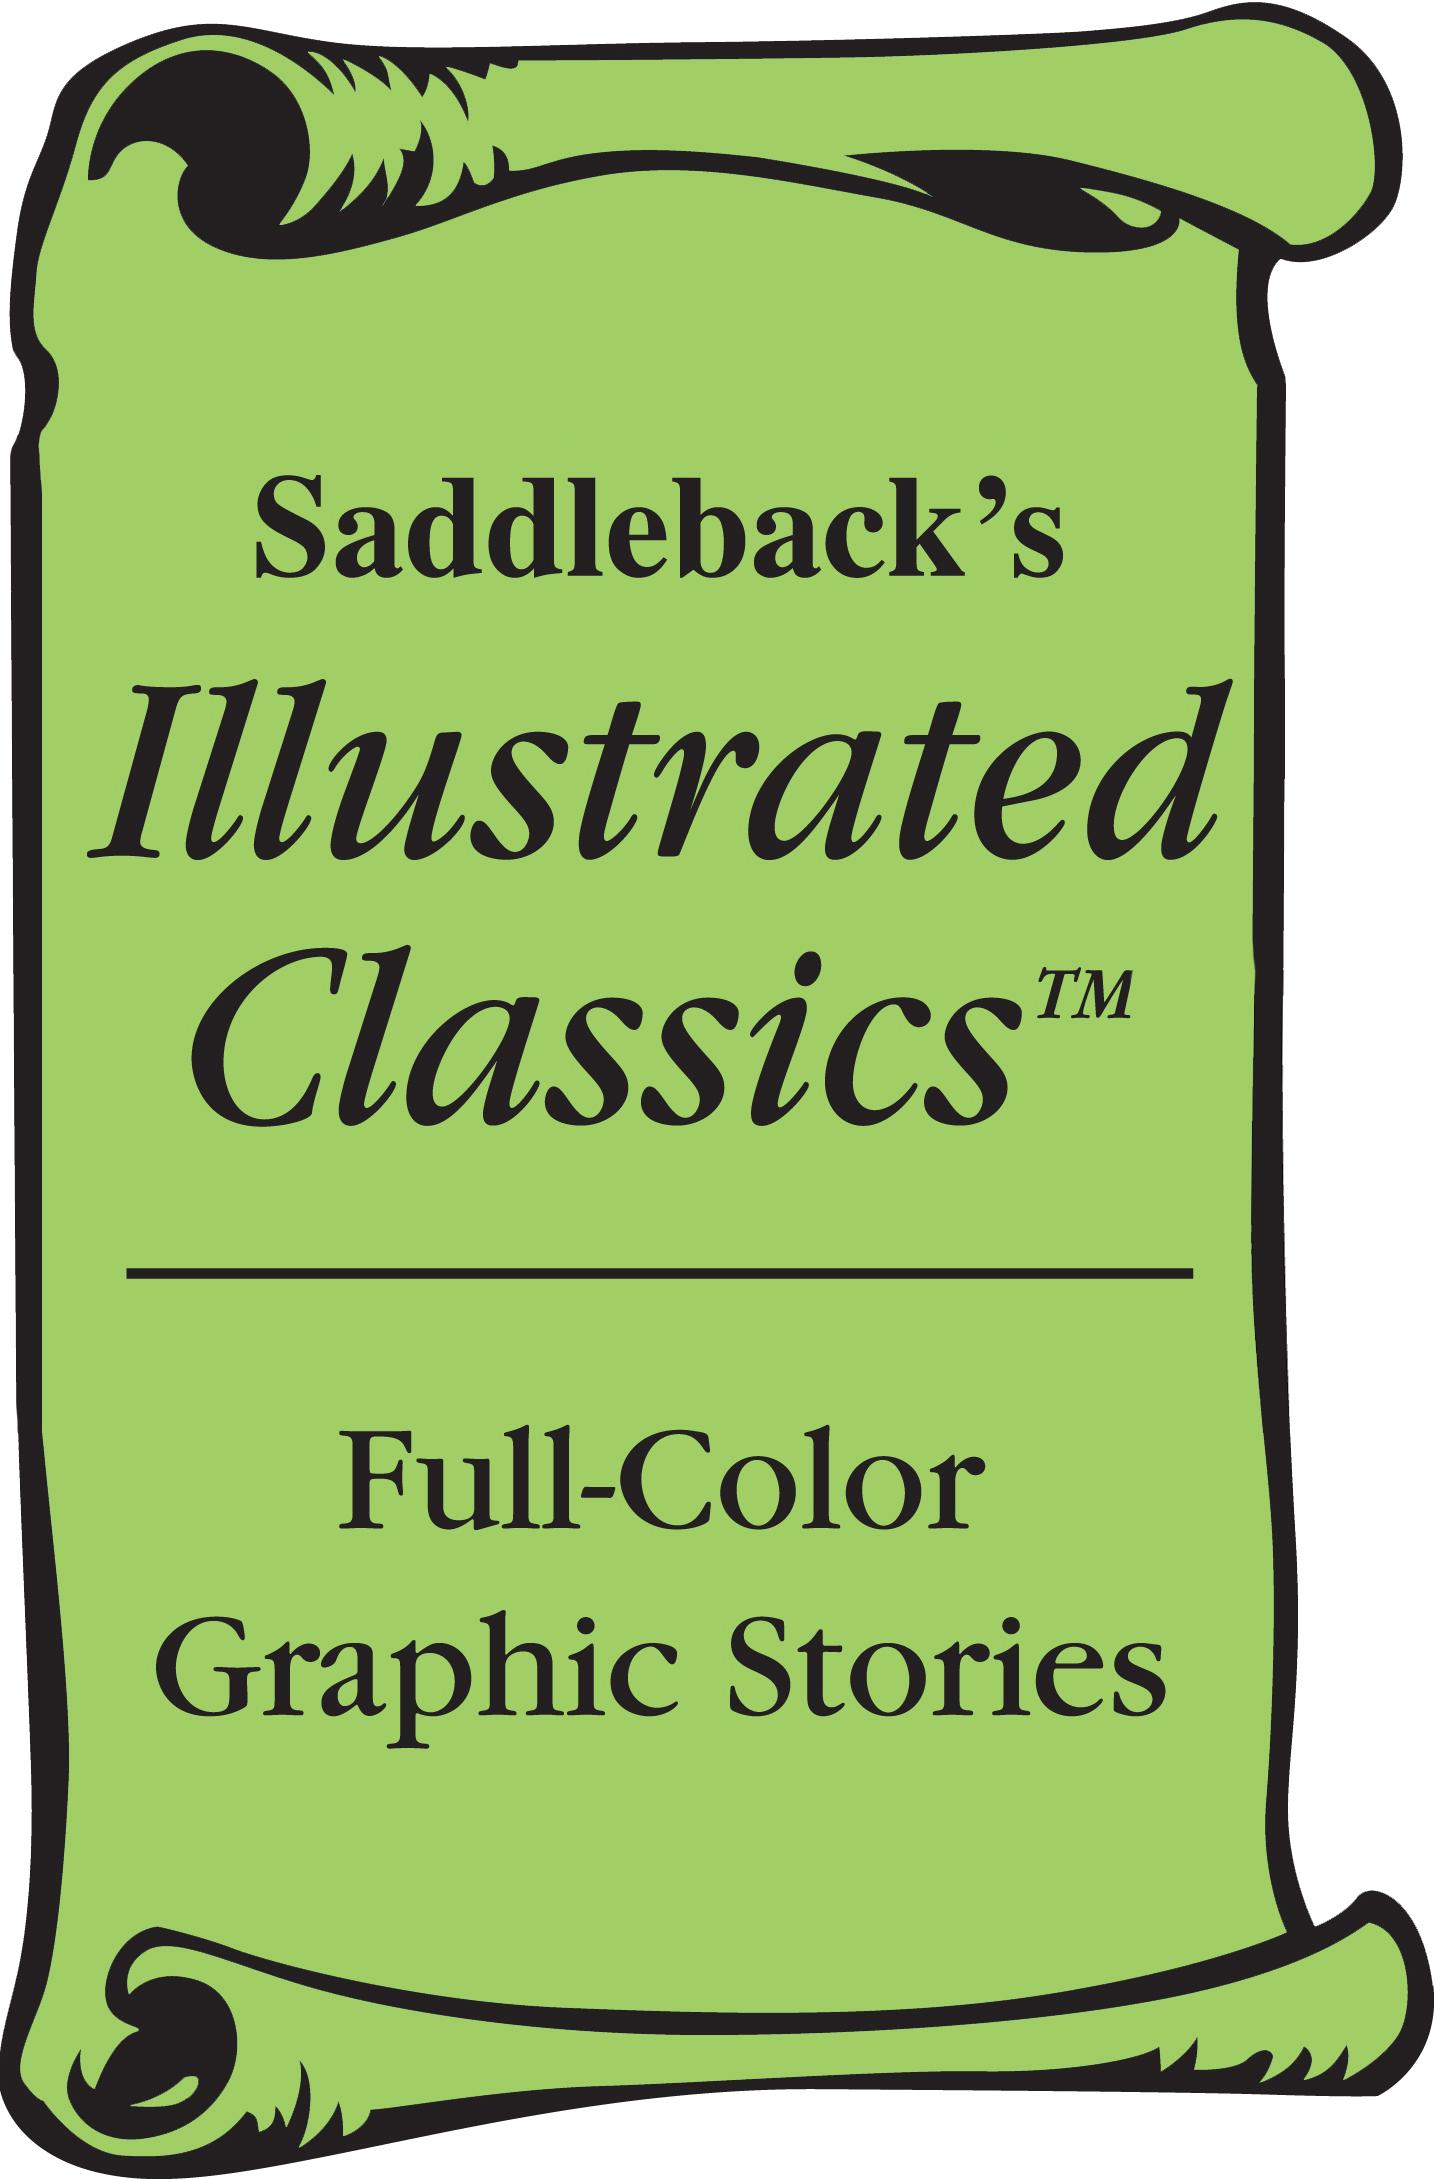 illustratedclassics-logo.jpg